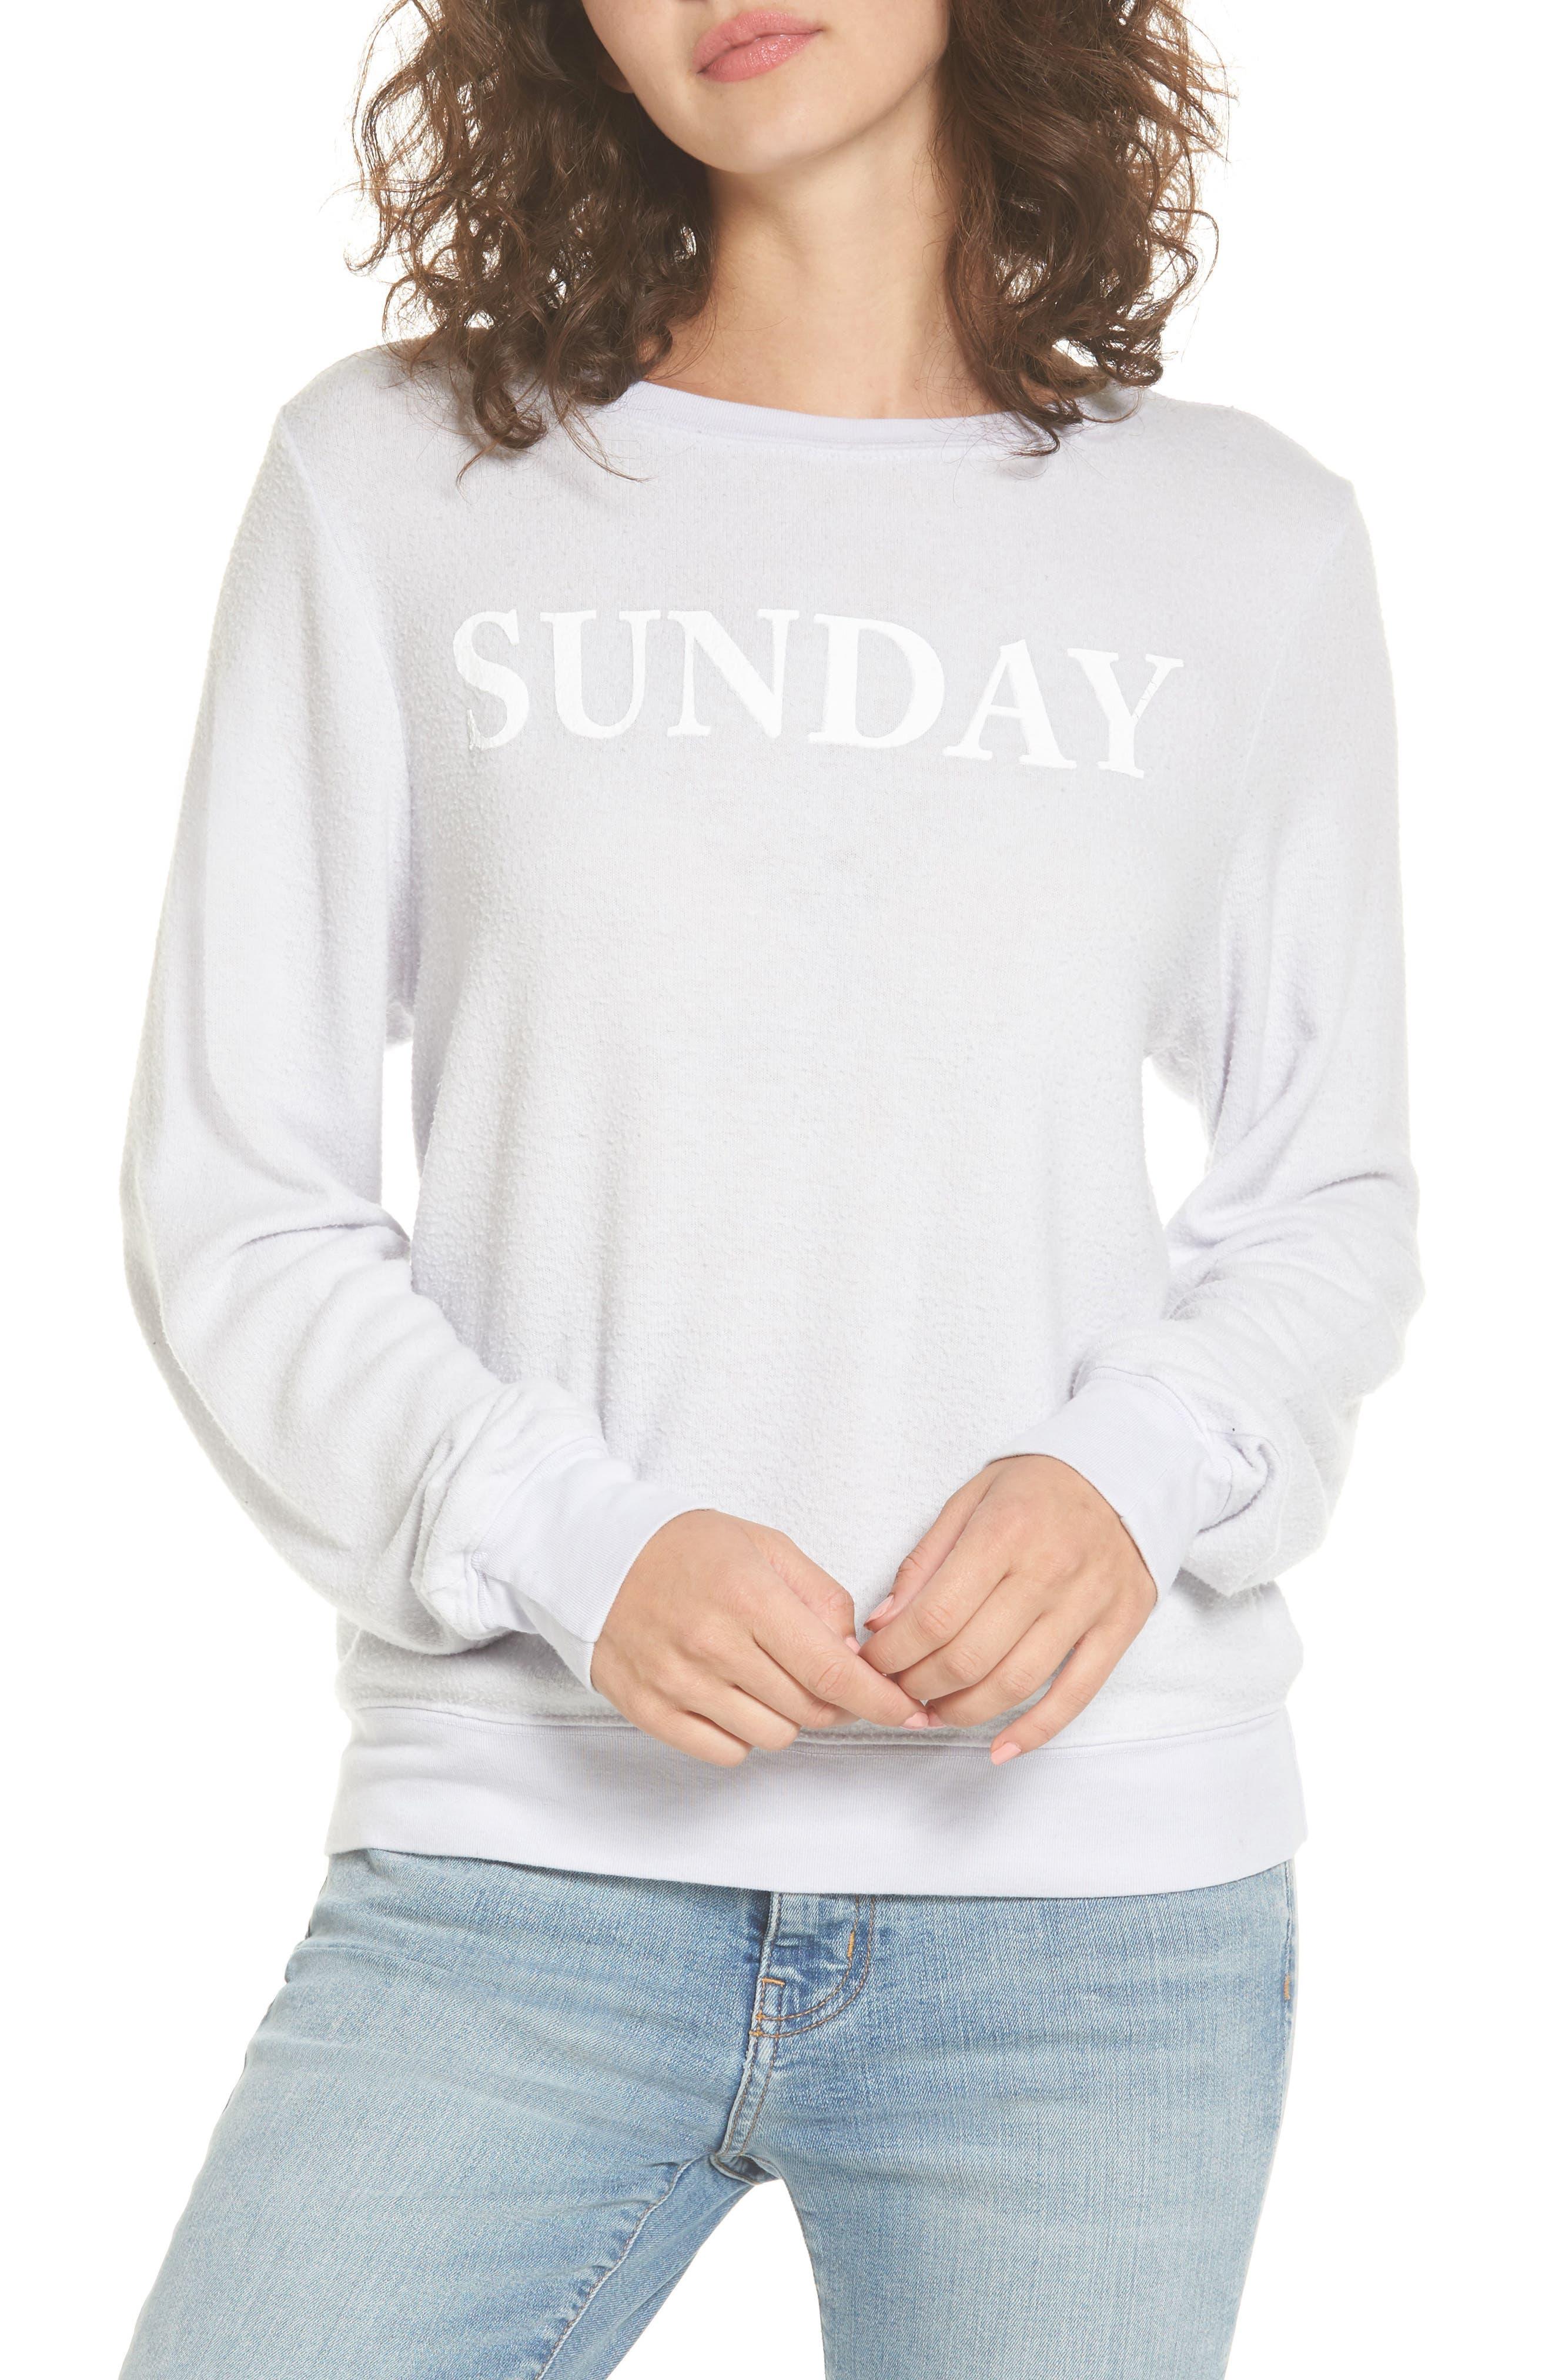 Sunday Sweatshirt,                             Main thumbnail 1, color,                             450